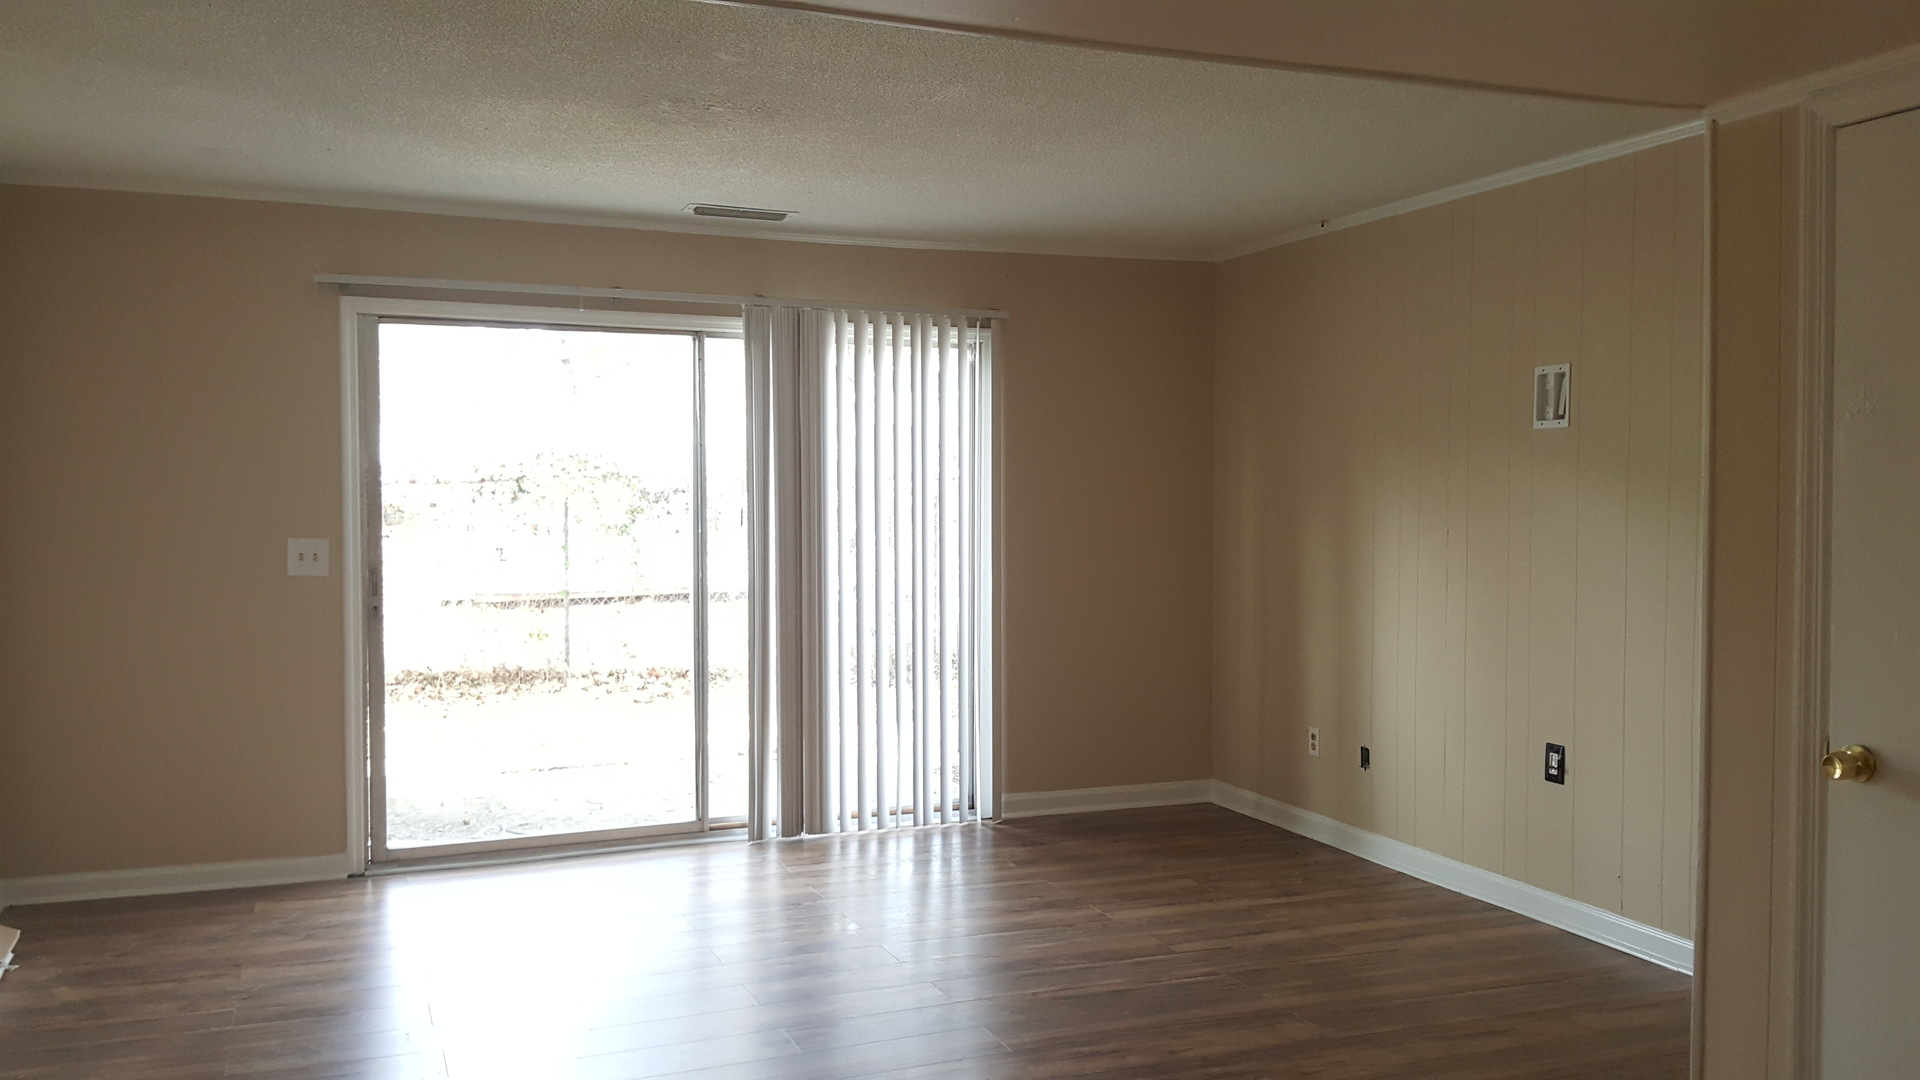 2 Bedroom Townhome W/ Wood Floors